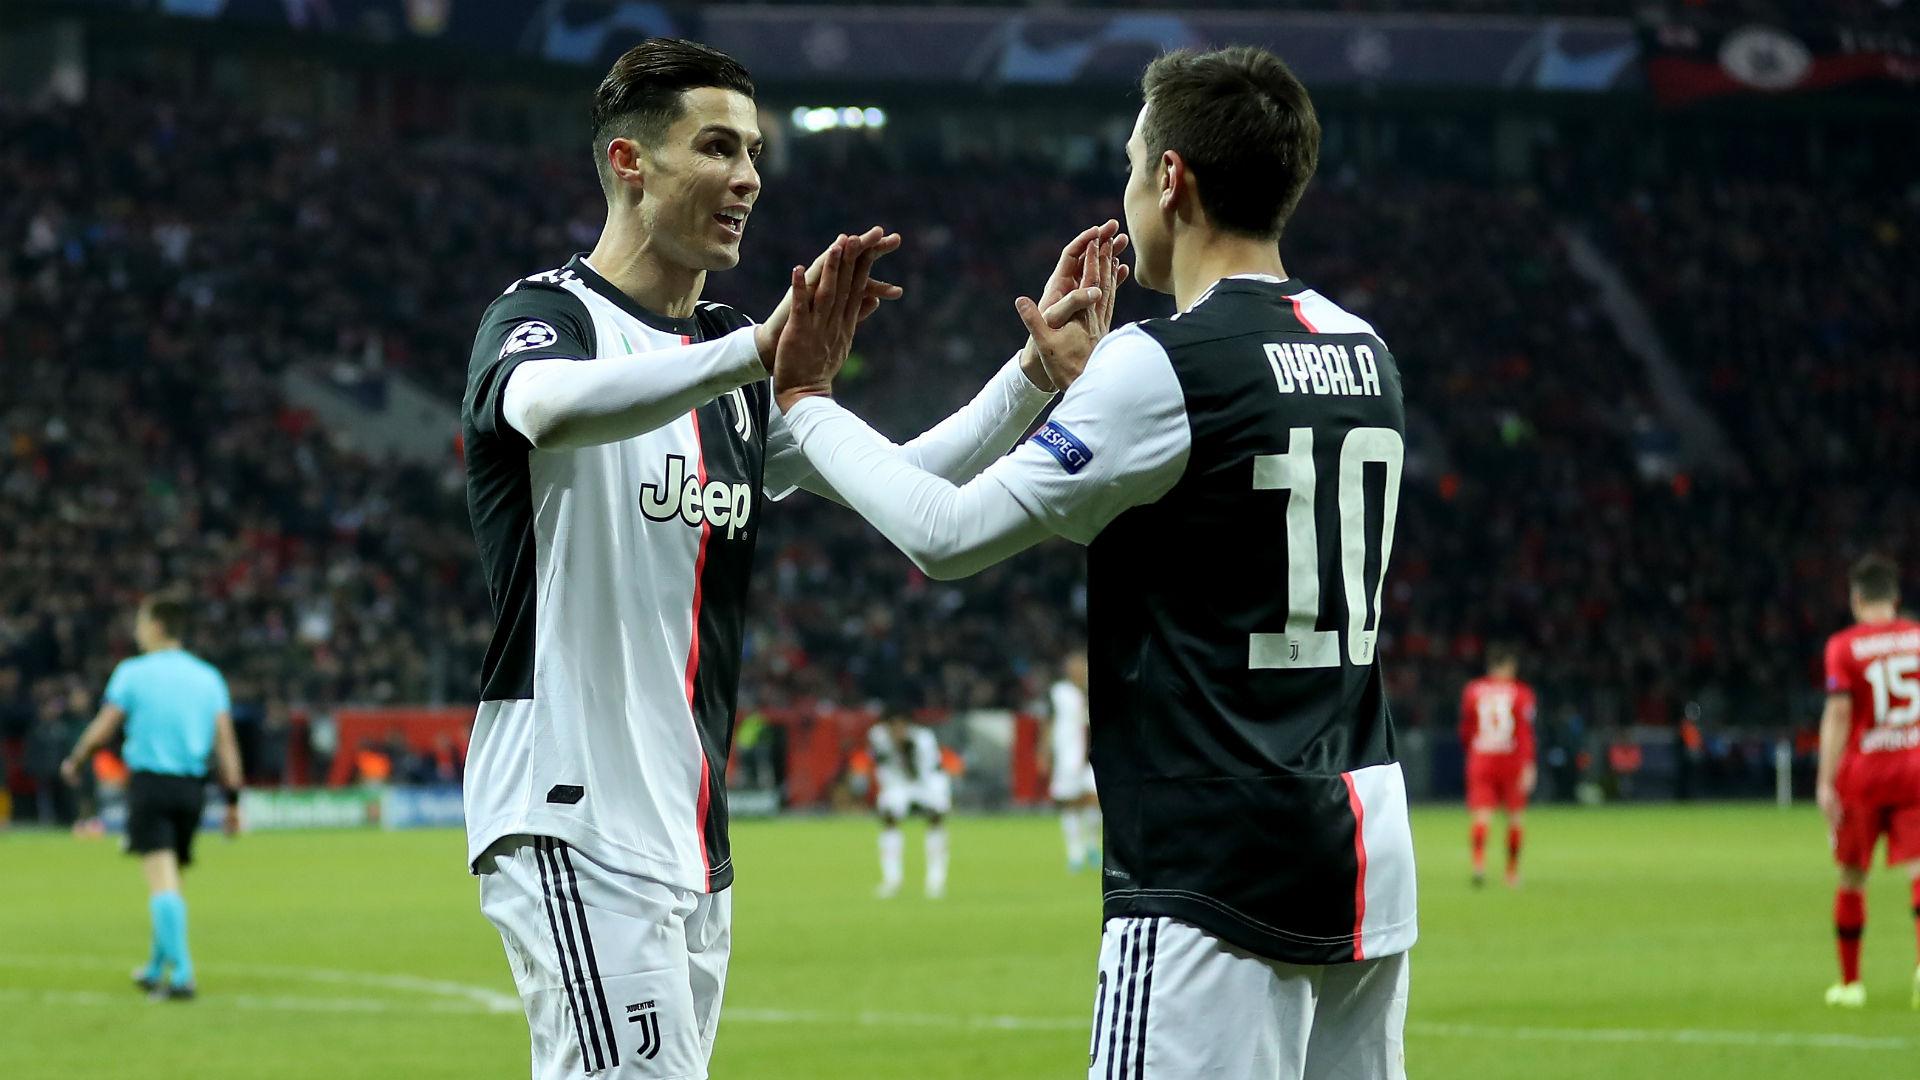 Sarri confident over Ronaldo-Dybala alliance